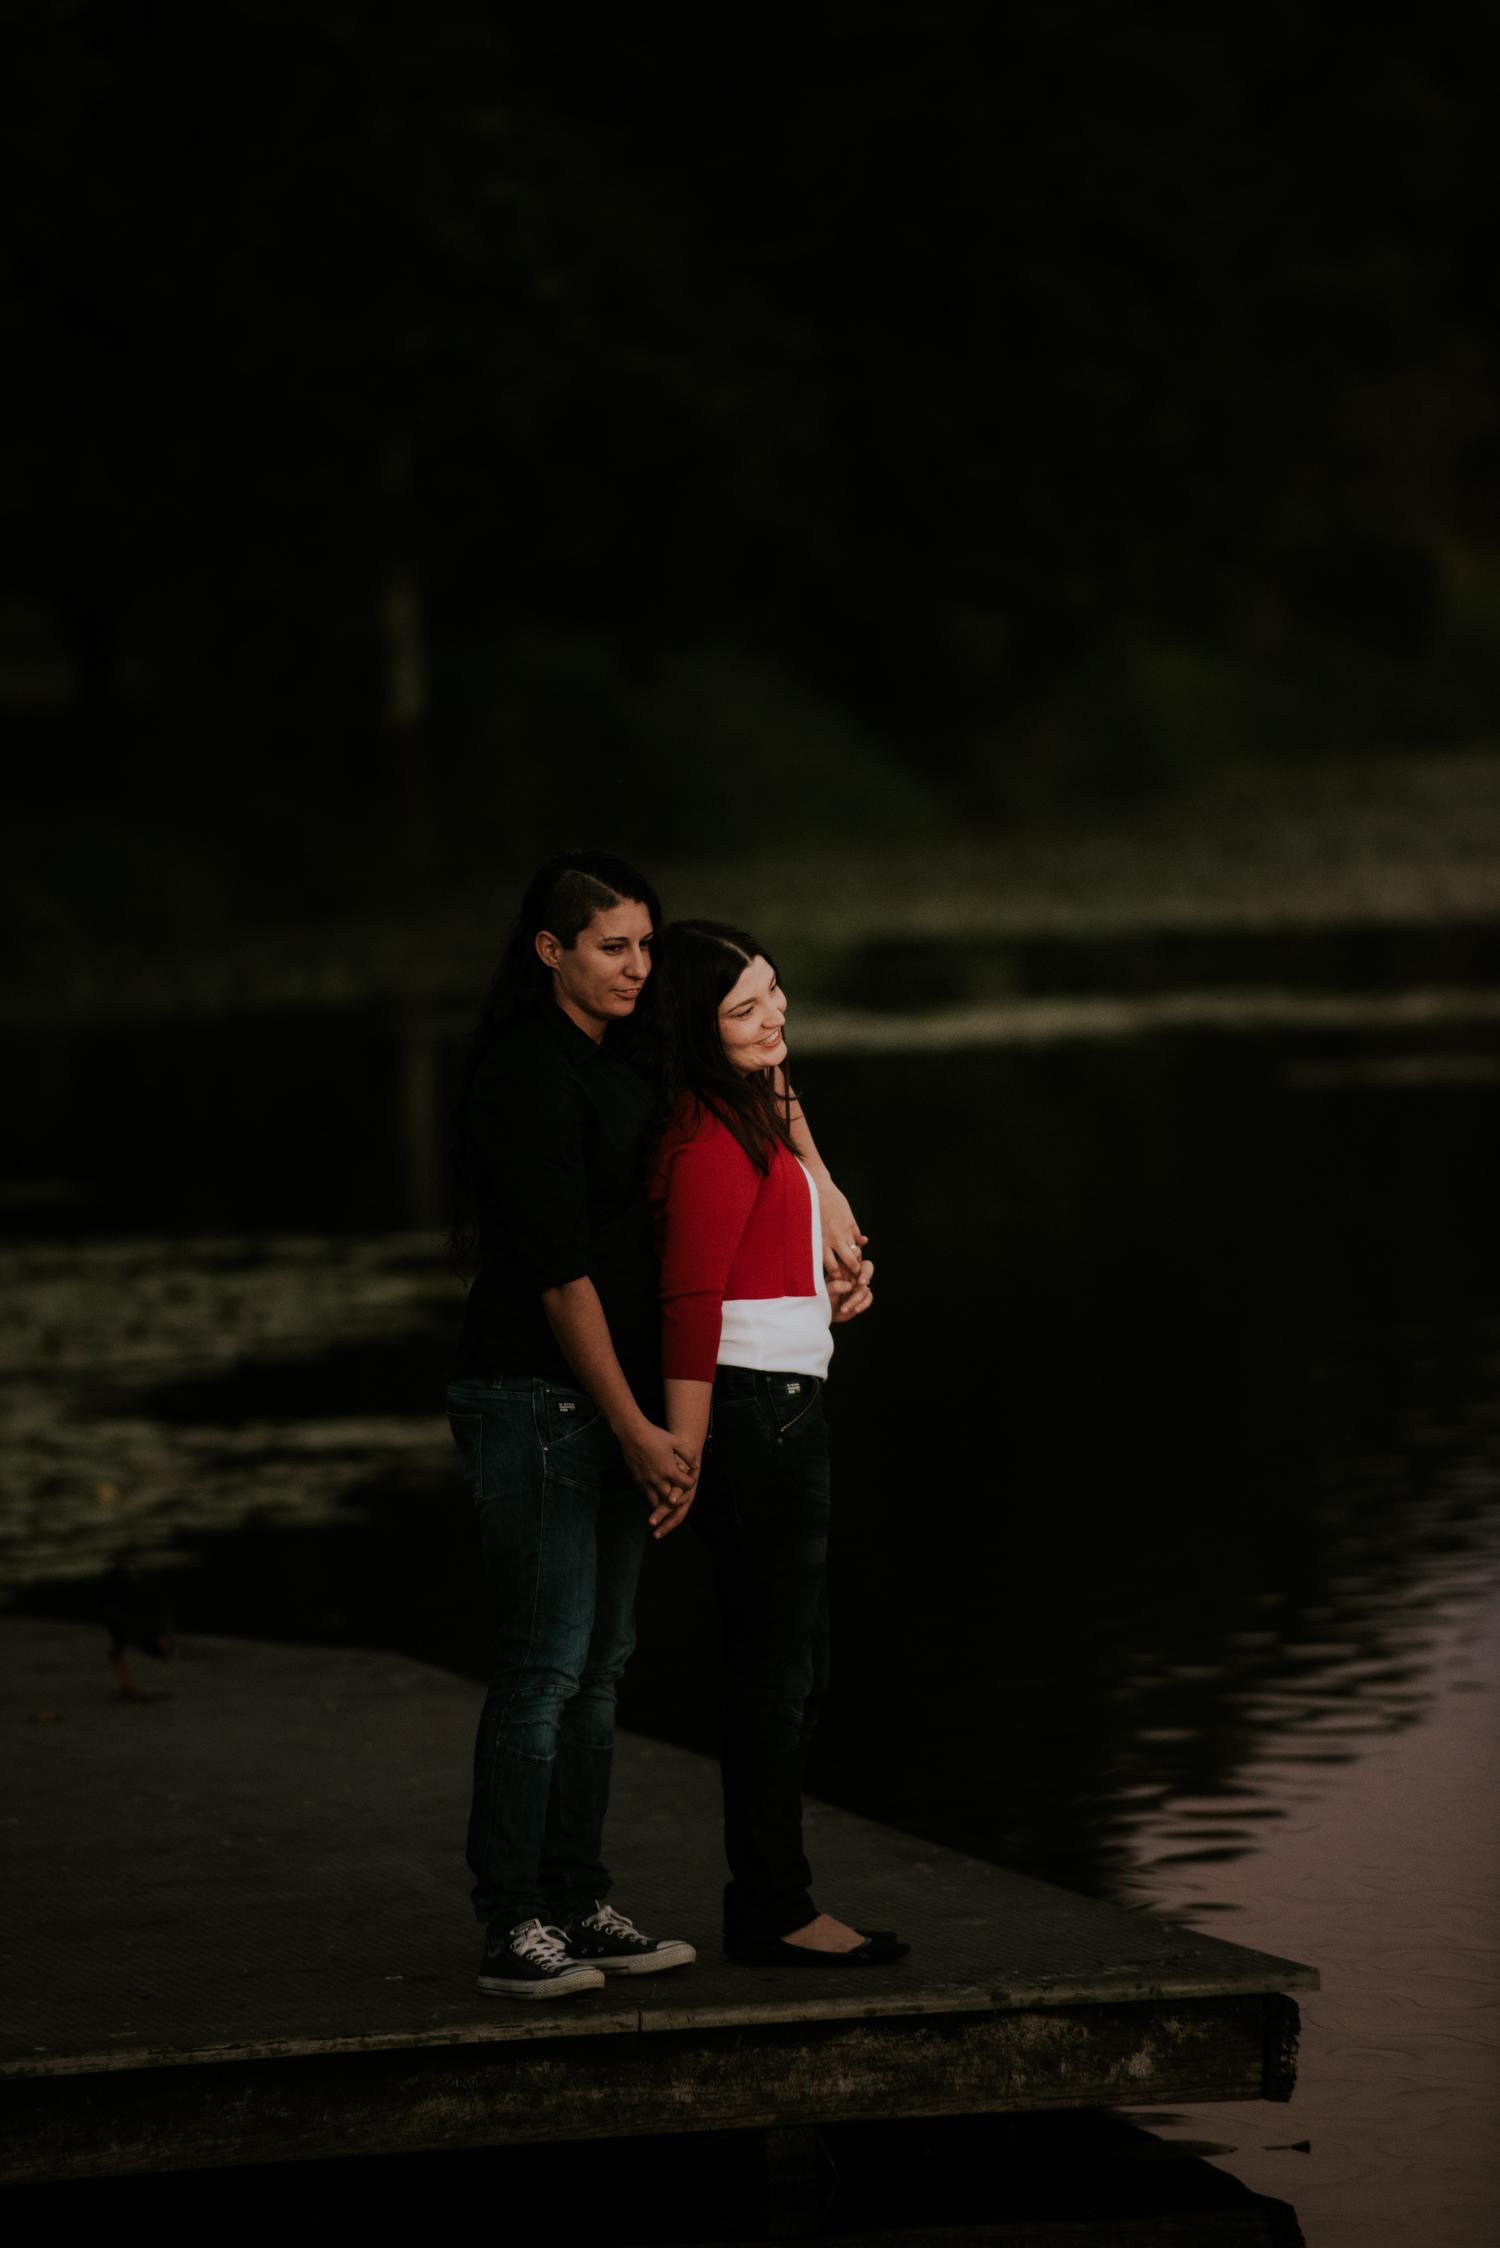 Brisbane Wedding Photographer | Engagement-Elopement Photography-32.jpg